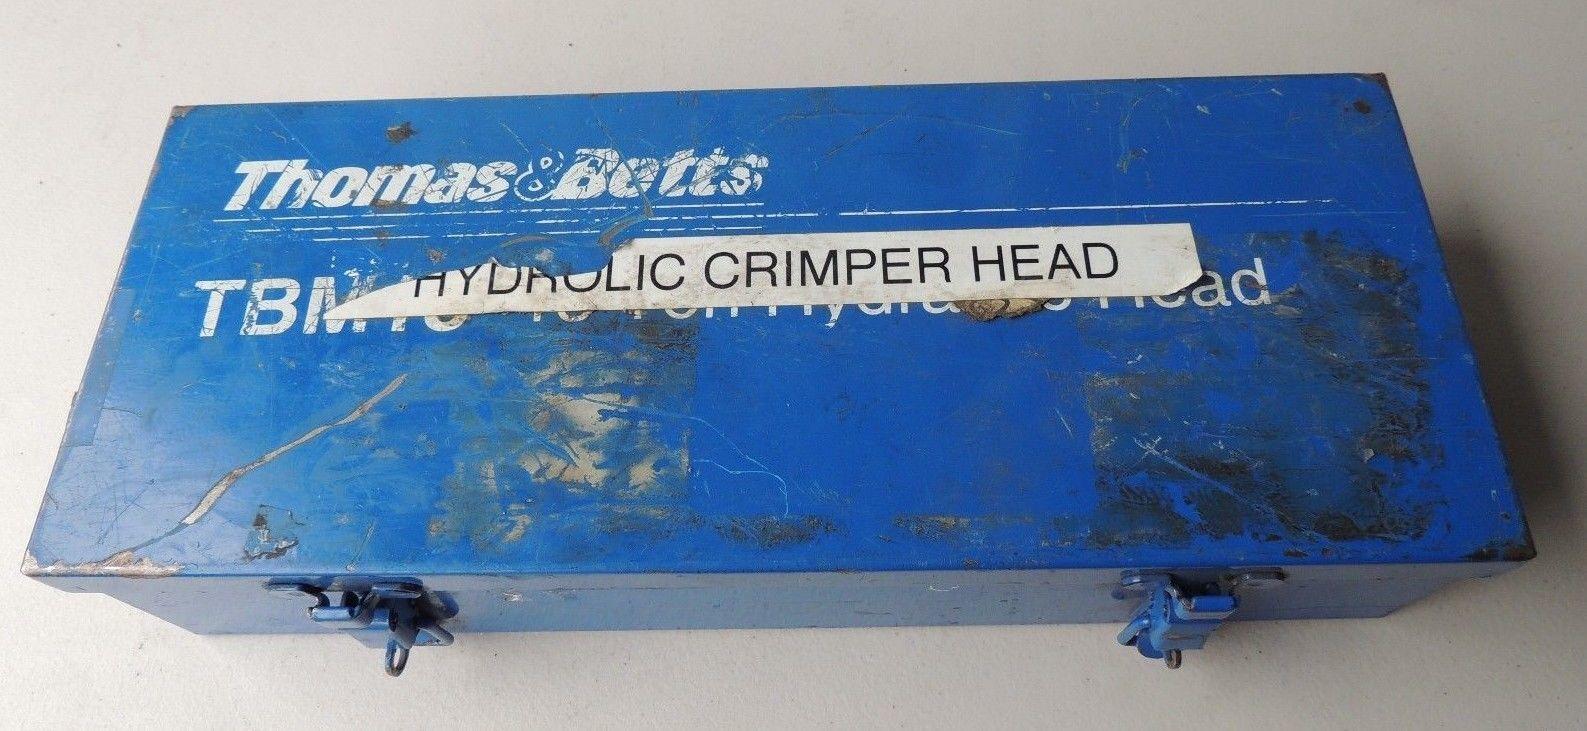 T&B Thomas & Betts TBM15 Insulated Hydraulic and 50 similar items